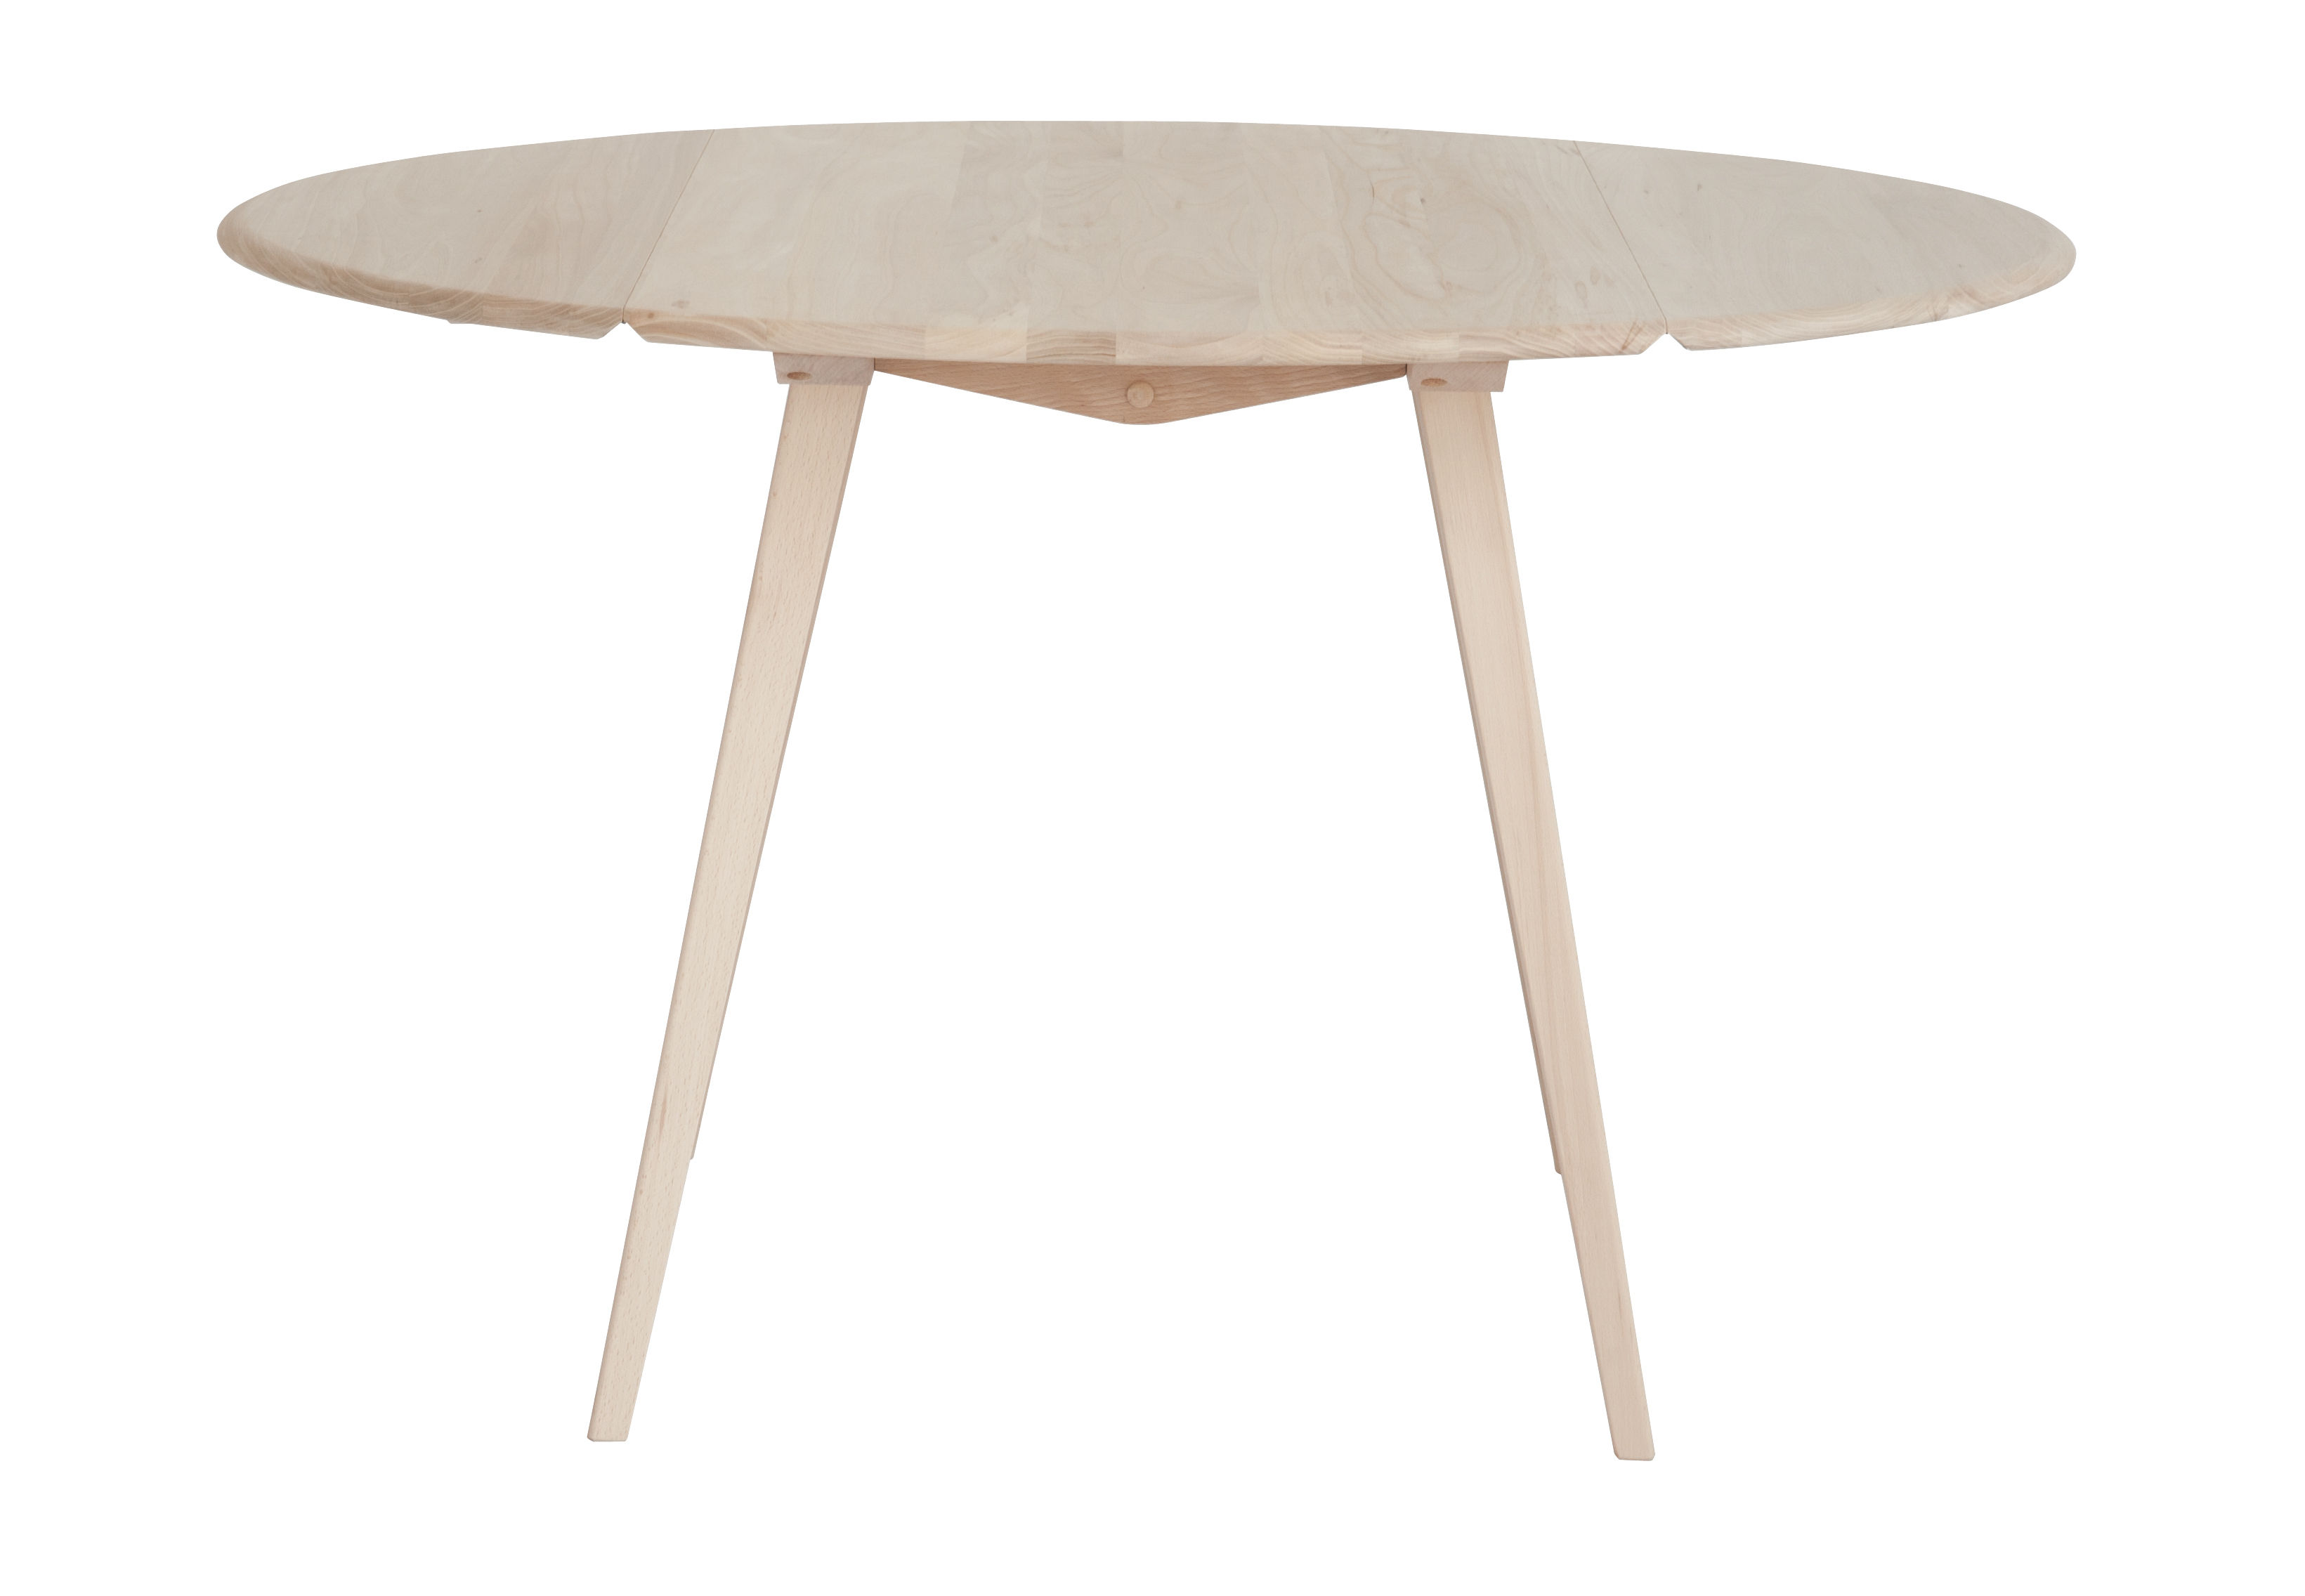 Furniture - Dining Tables - Drop Leaf Extending table - Ø 110 cm / Oak by Ercol - Natural wood - Natural beechwood, Solid elm